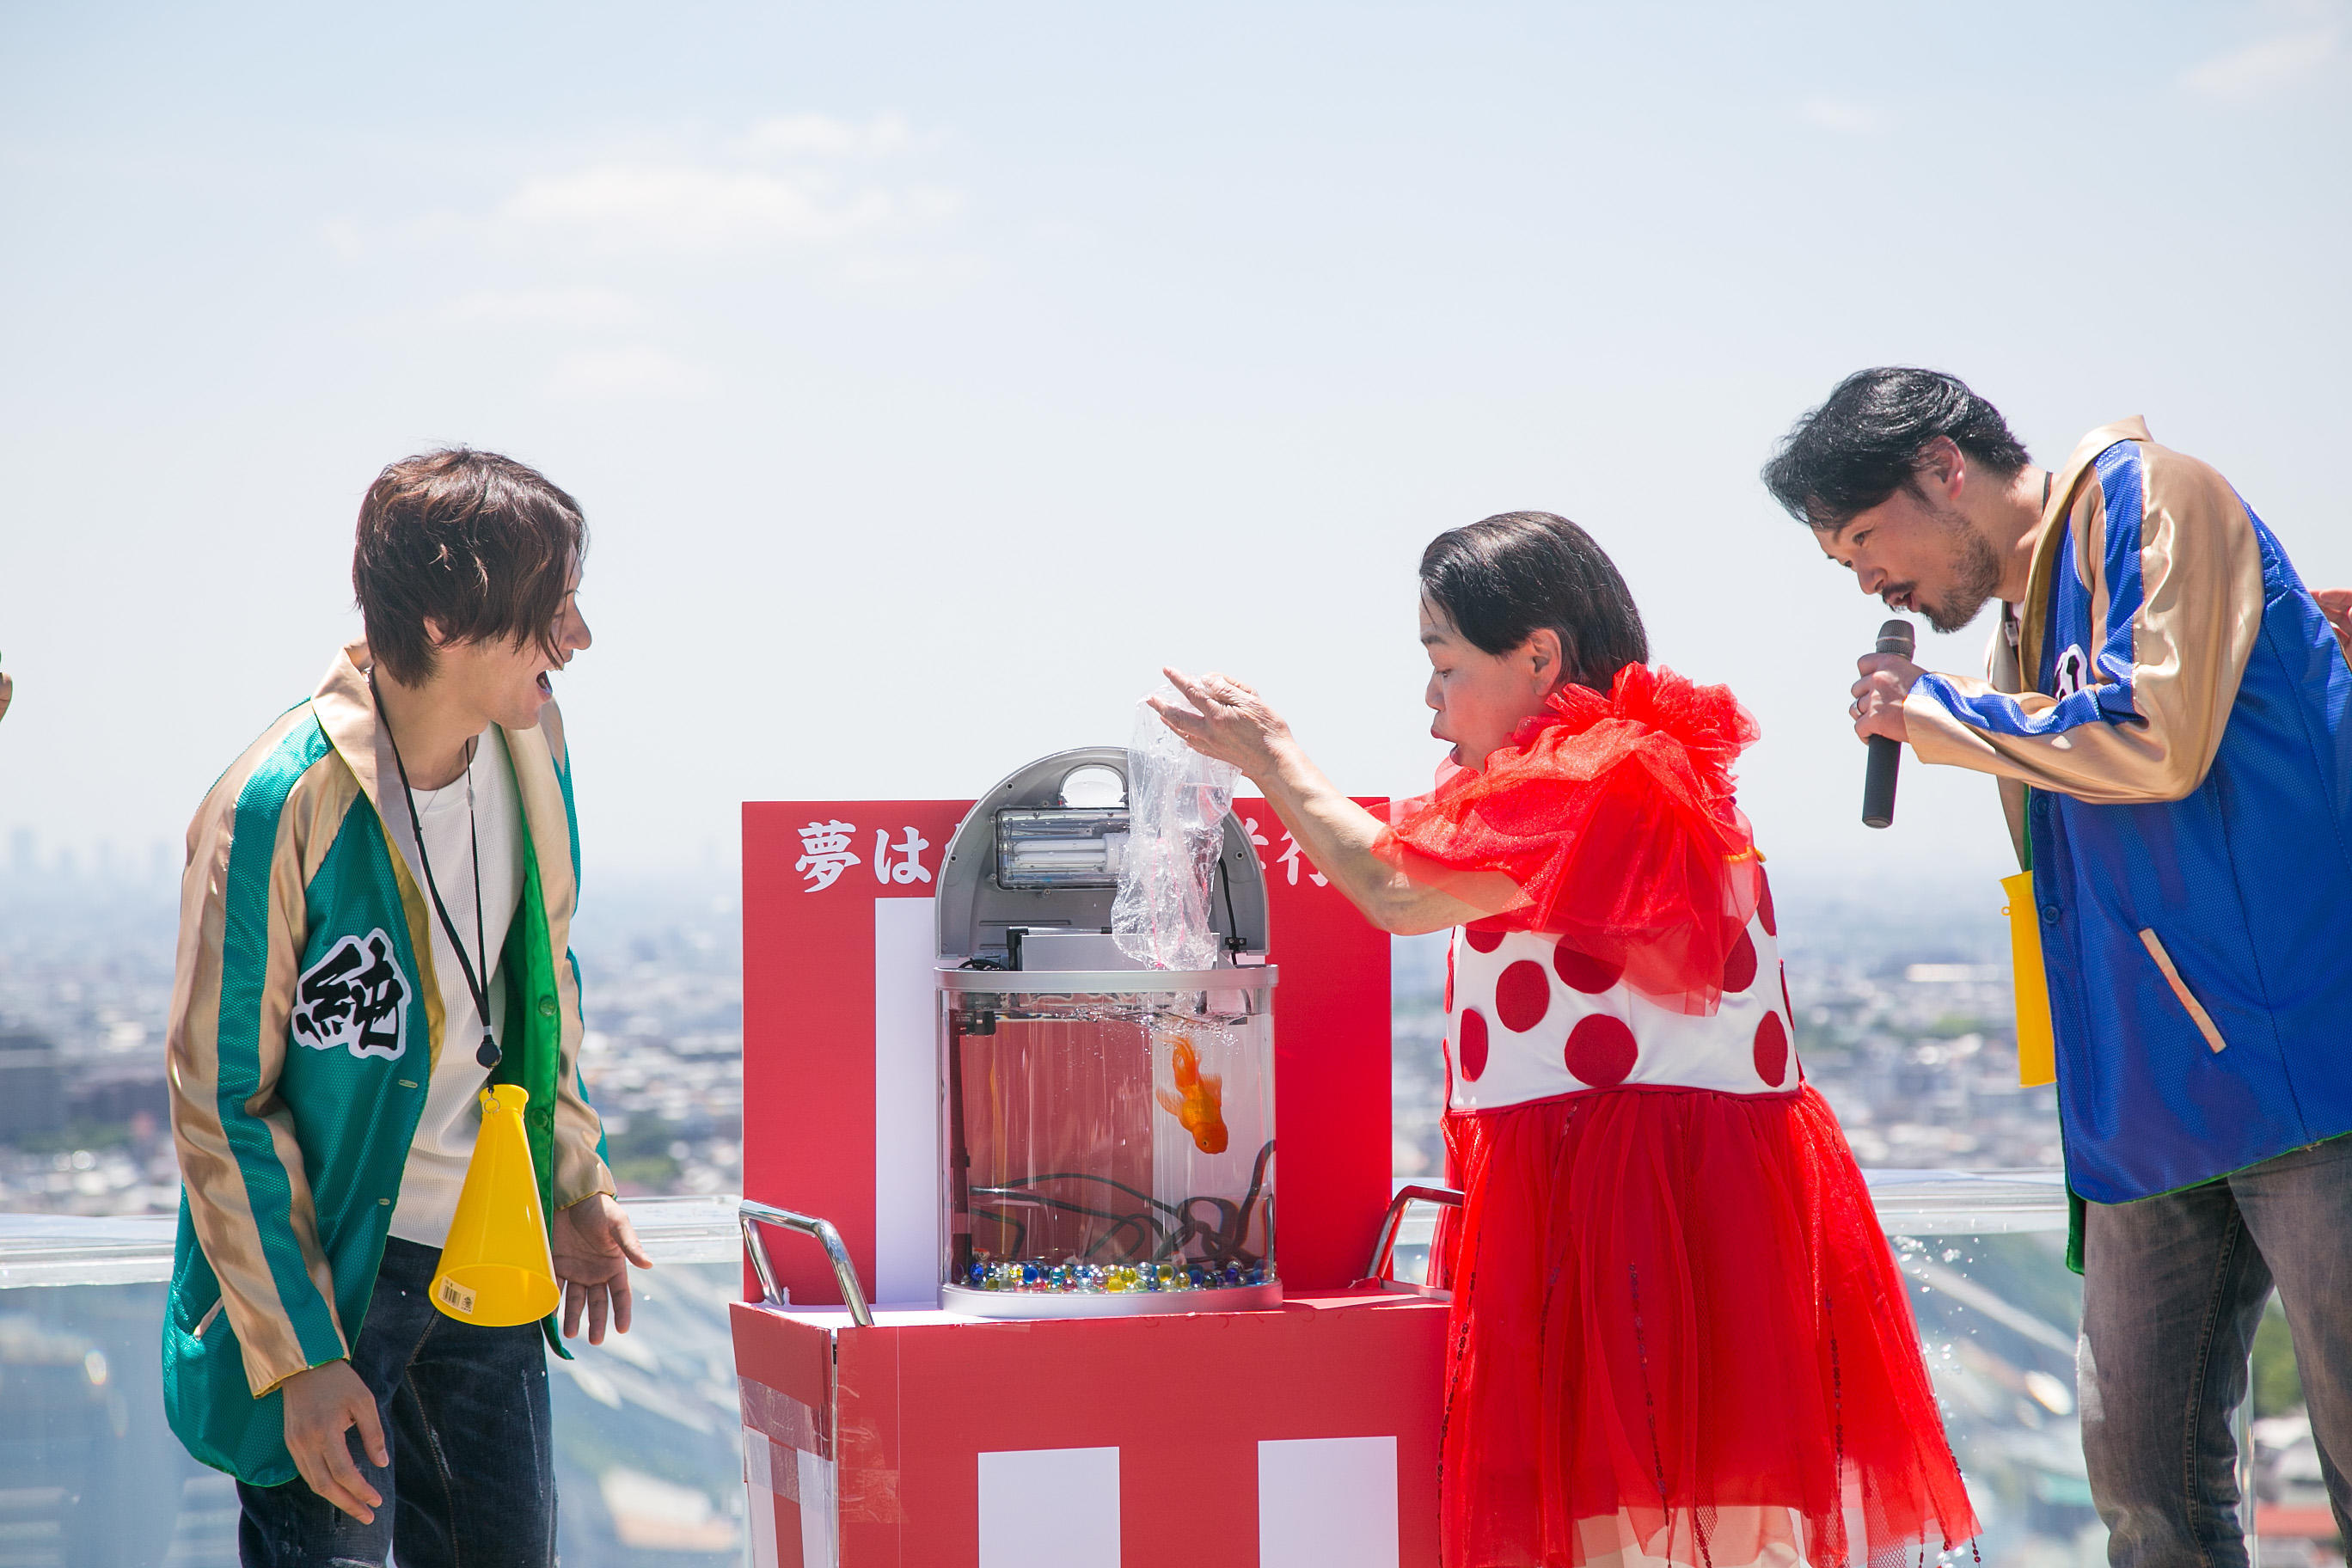 http://news.yoshimoto.co.jp/20180714162557-8aa3113a044eefe551d32a9e819fb456ecb399b2.jpg